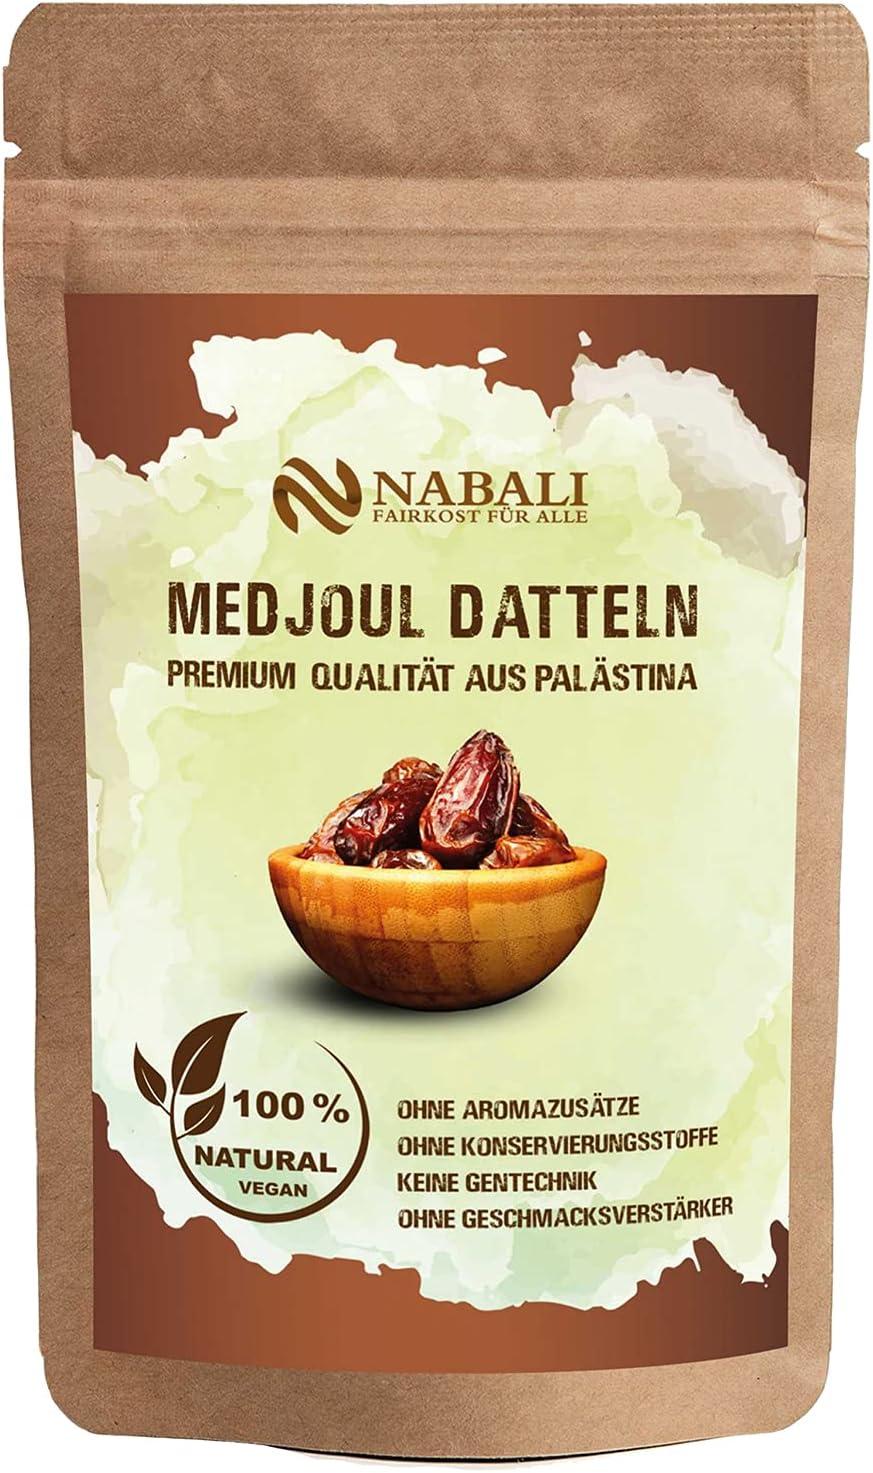 NABALI FAIRKOST Medjoul dátiles de Palestina - 100% natural aromático Tradicional Fresco & Oriental I sin conservantes I vegano I dátiles Medjoul jumbo (400 g)